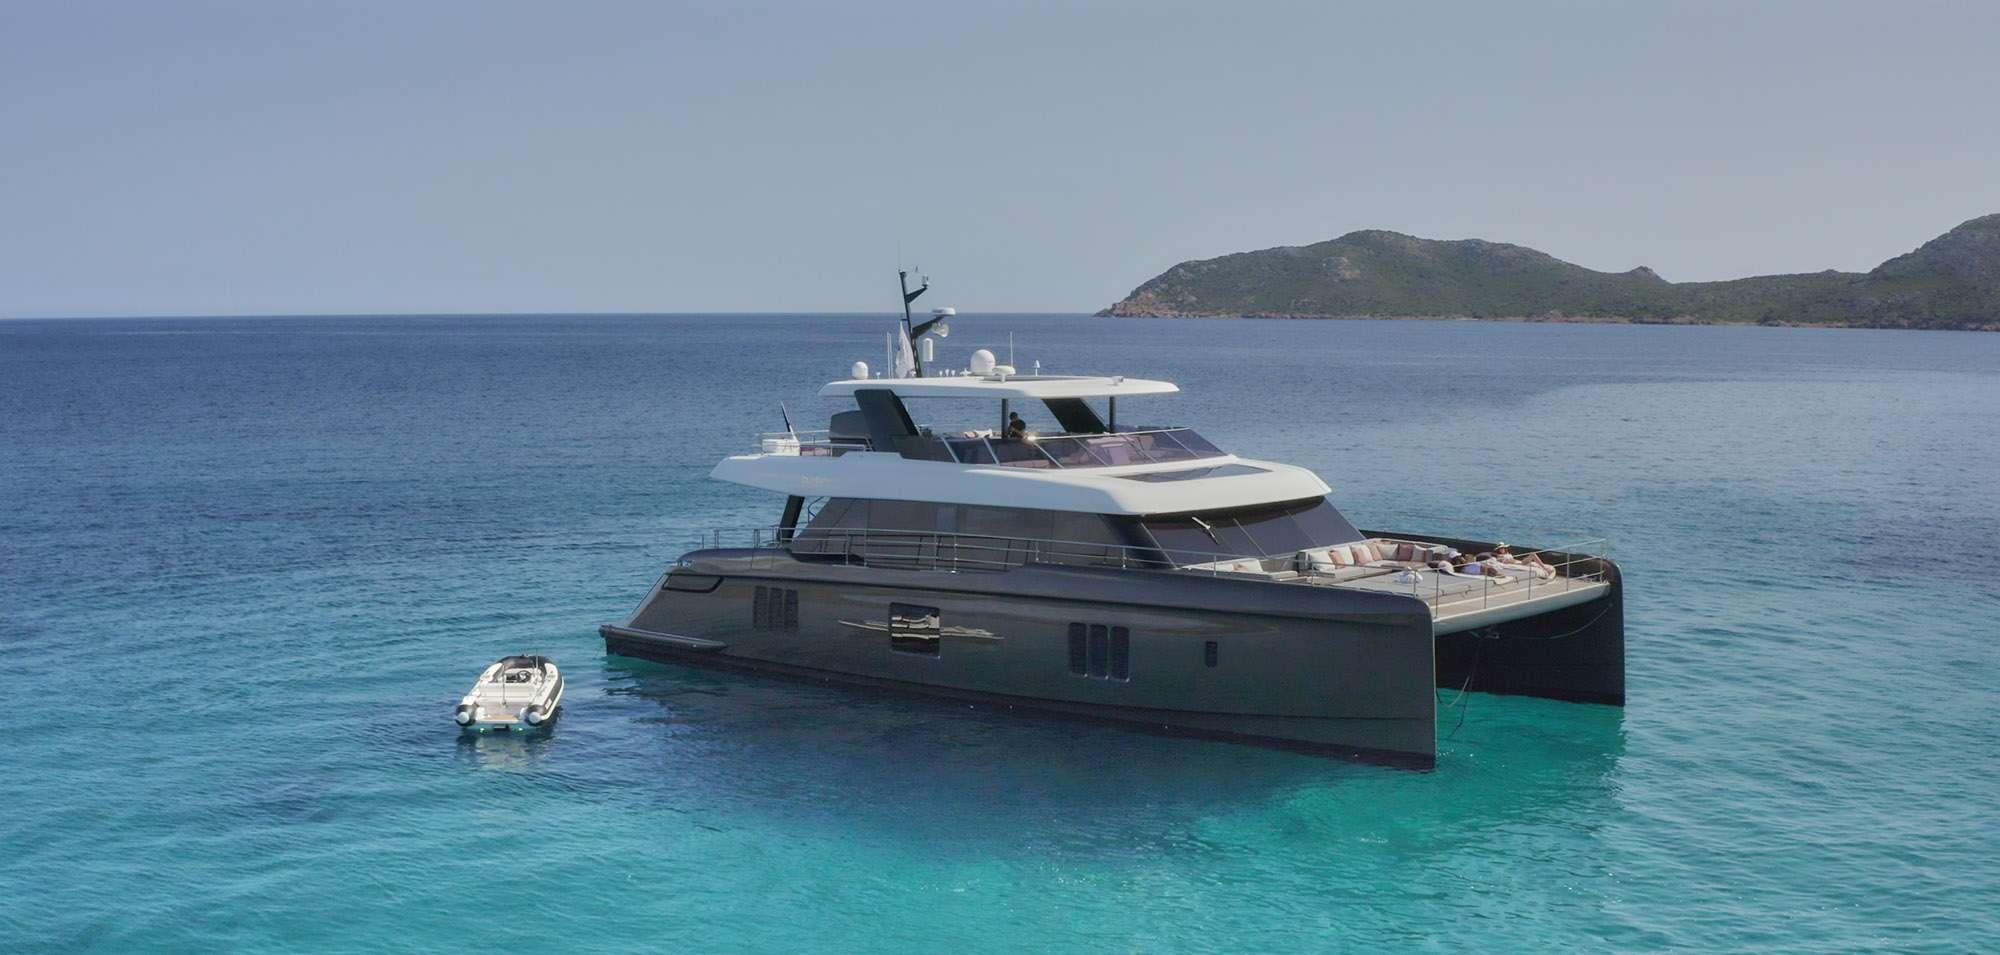 Crewed Luxury Catamaran in the Mediterranean